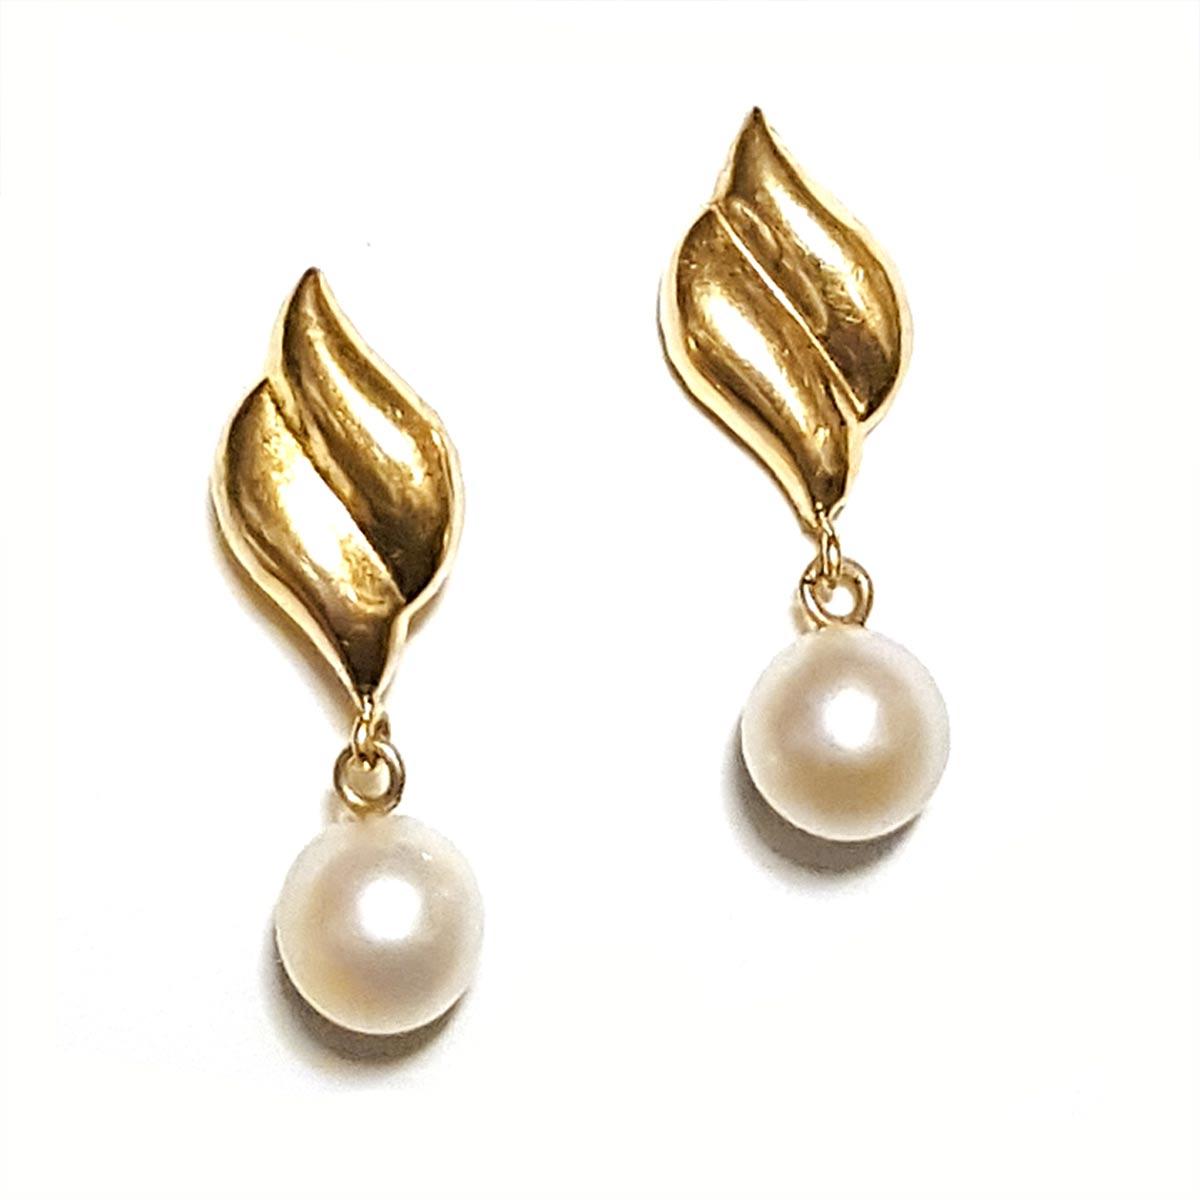 14k Pearl Drop Earrings Solid Yellow Gold Flourish Cultured